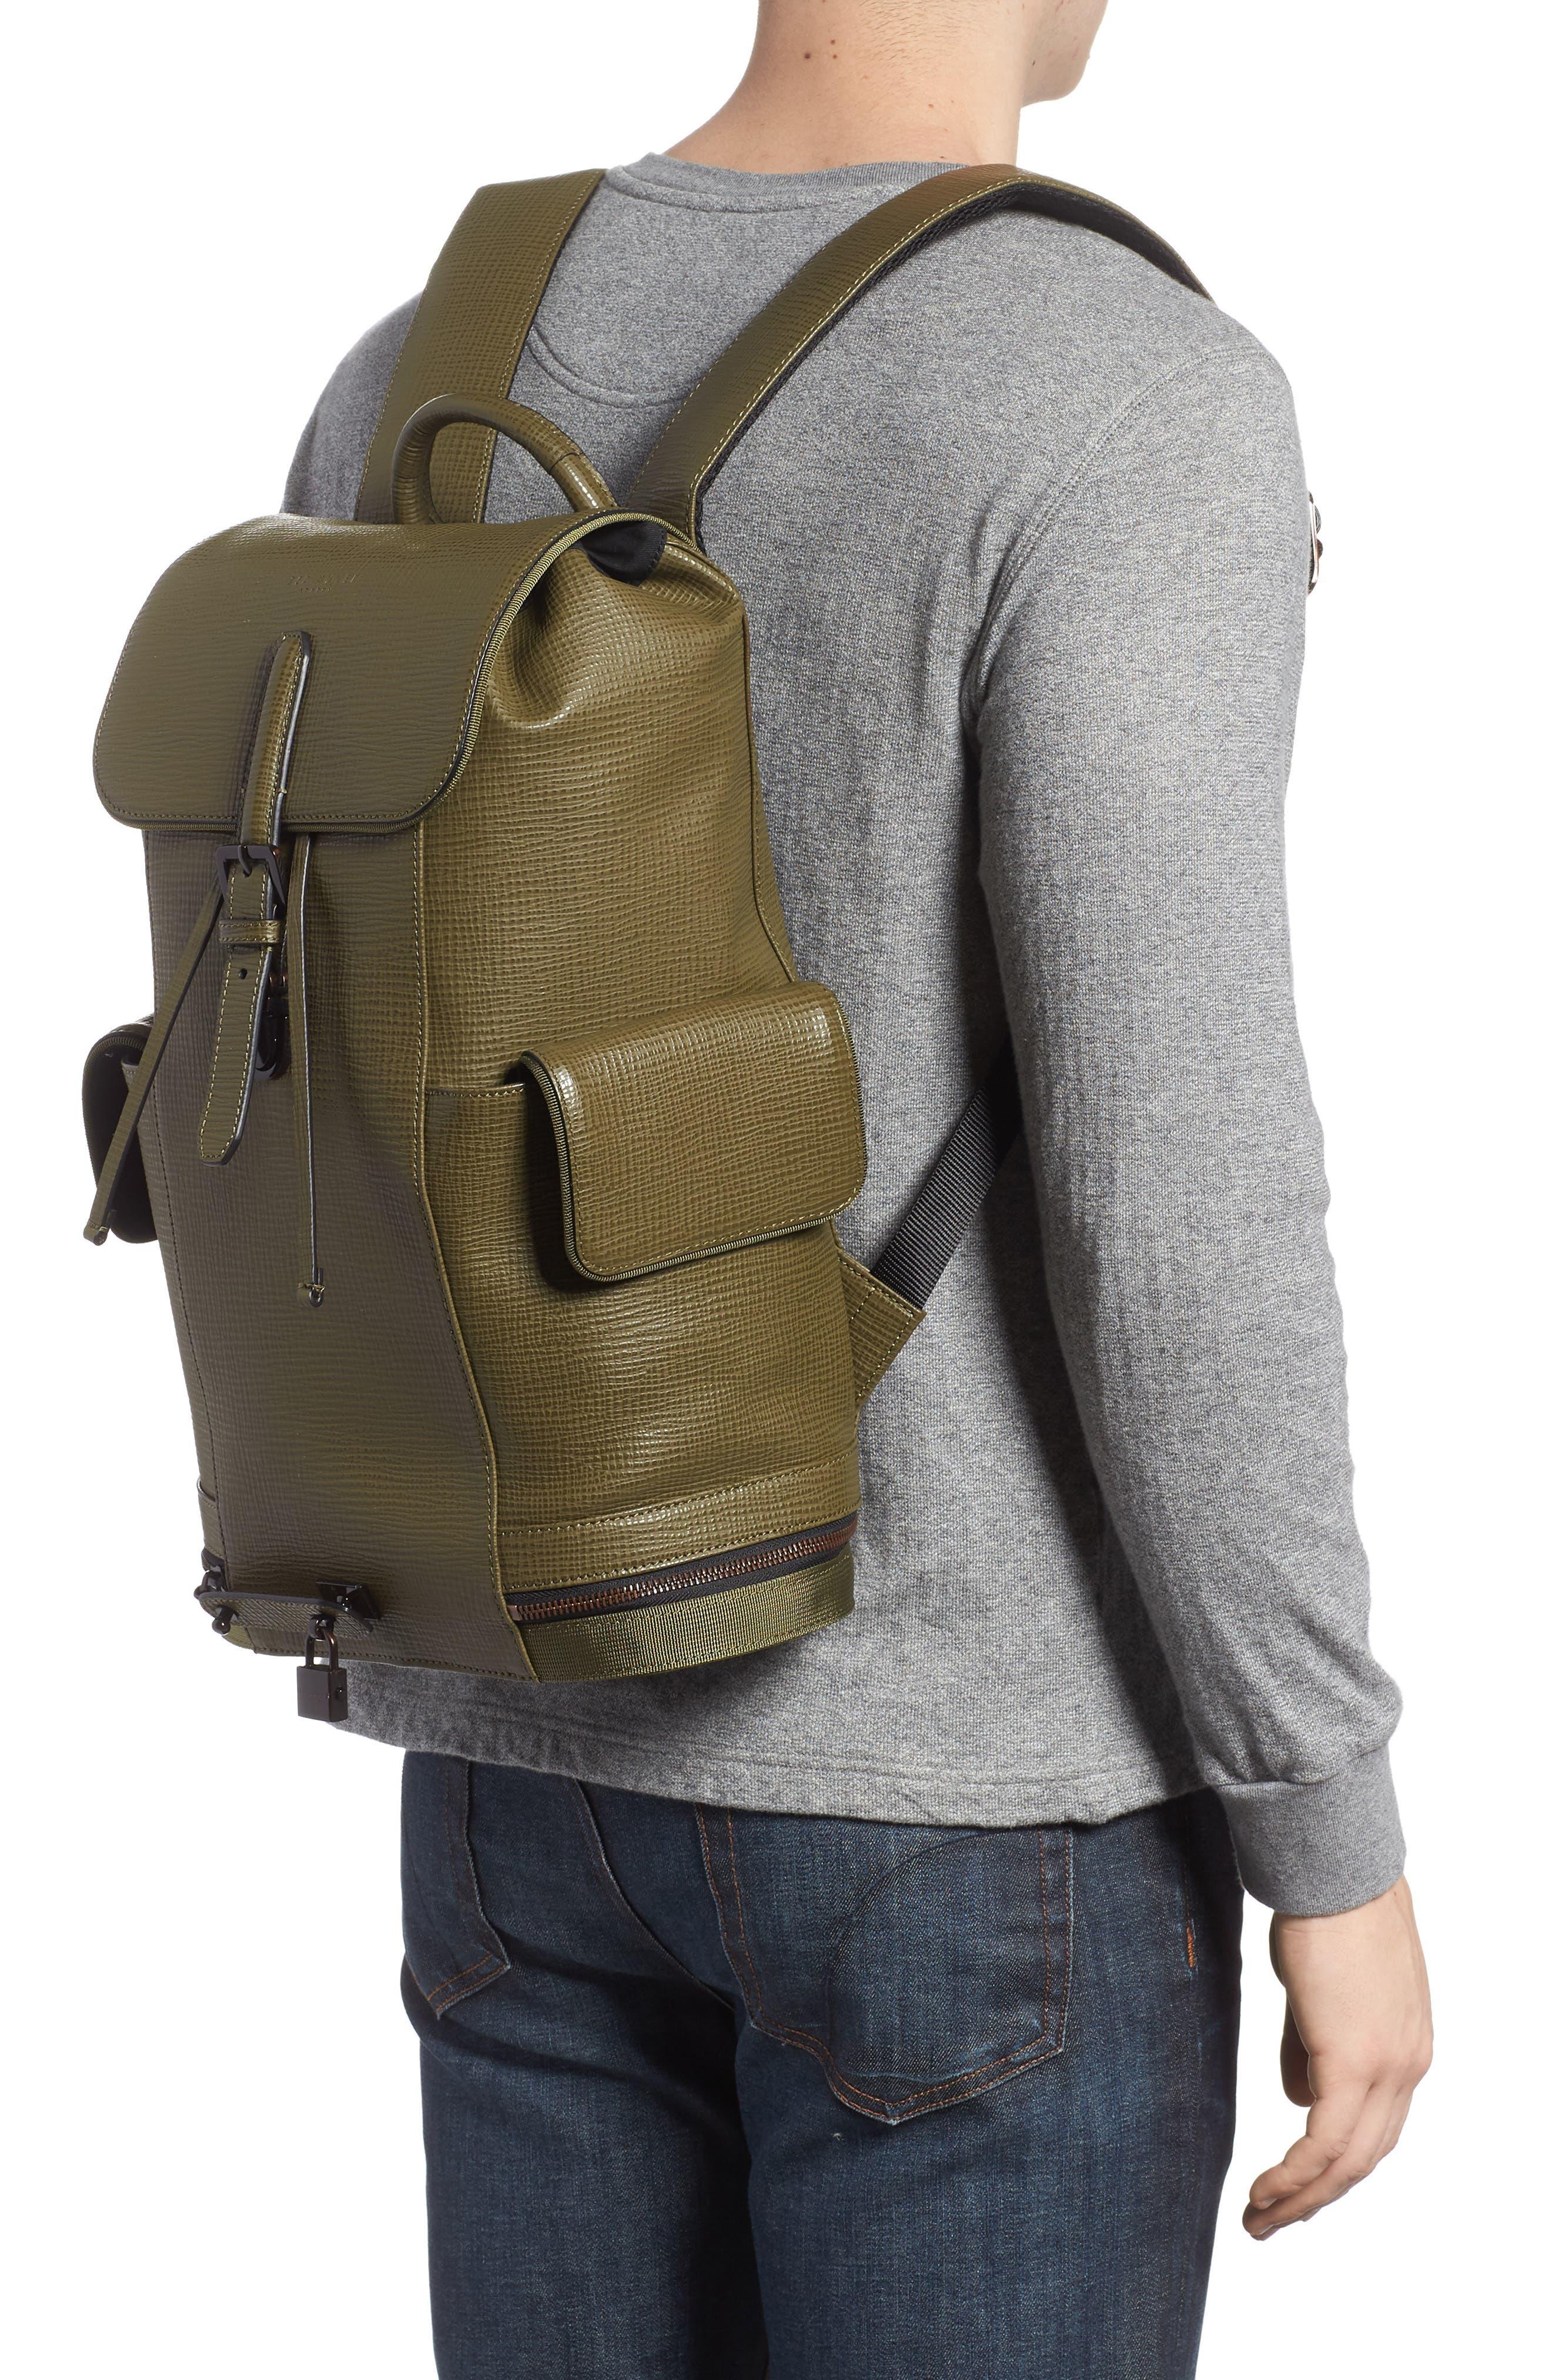 Thorr Palmelato Backpack,                             Alternate thumbnail 2, color,                             Olive